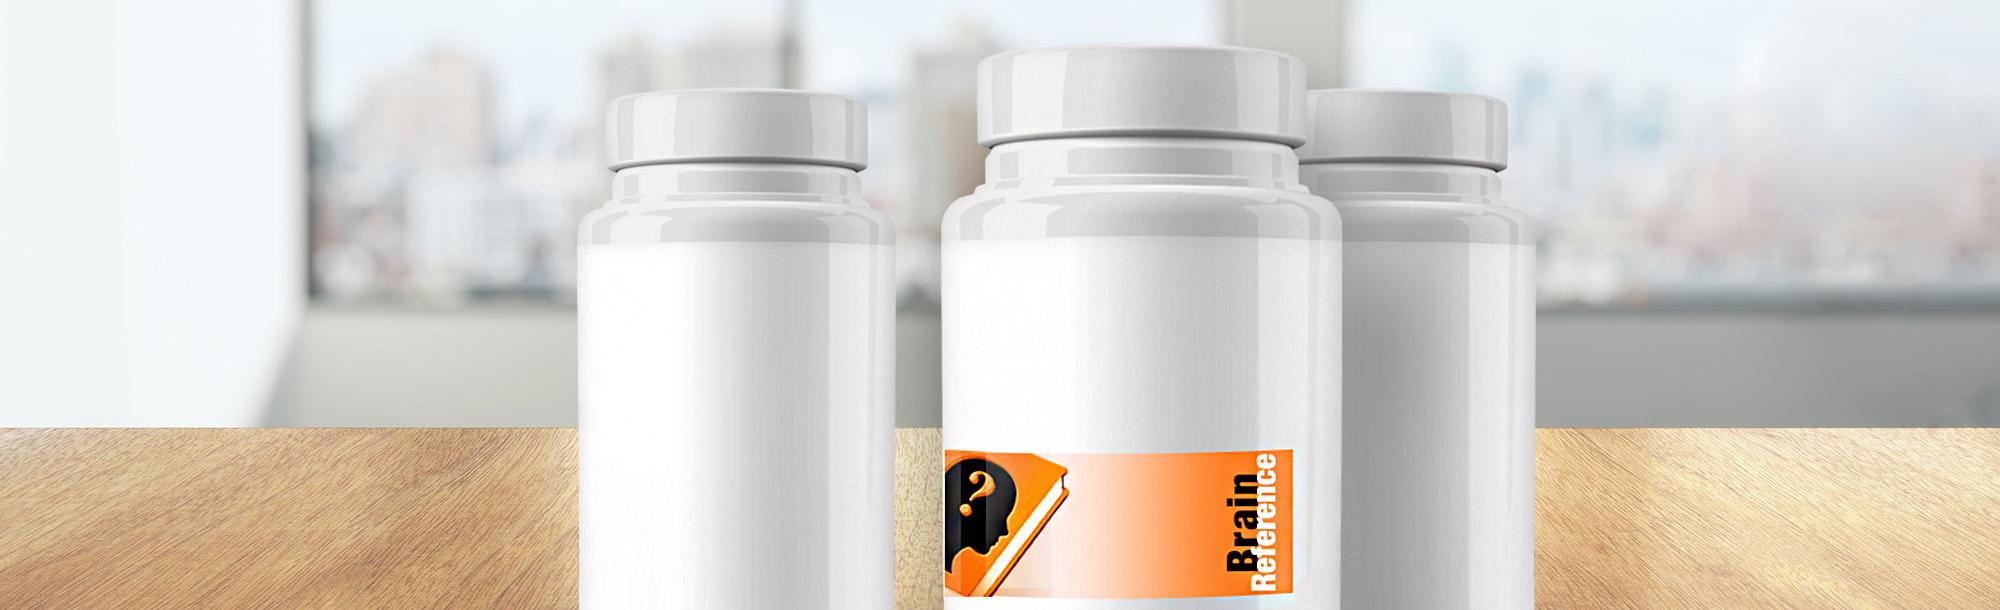 Cytogenix Laboratories Xenadrine Ultra Review